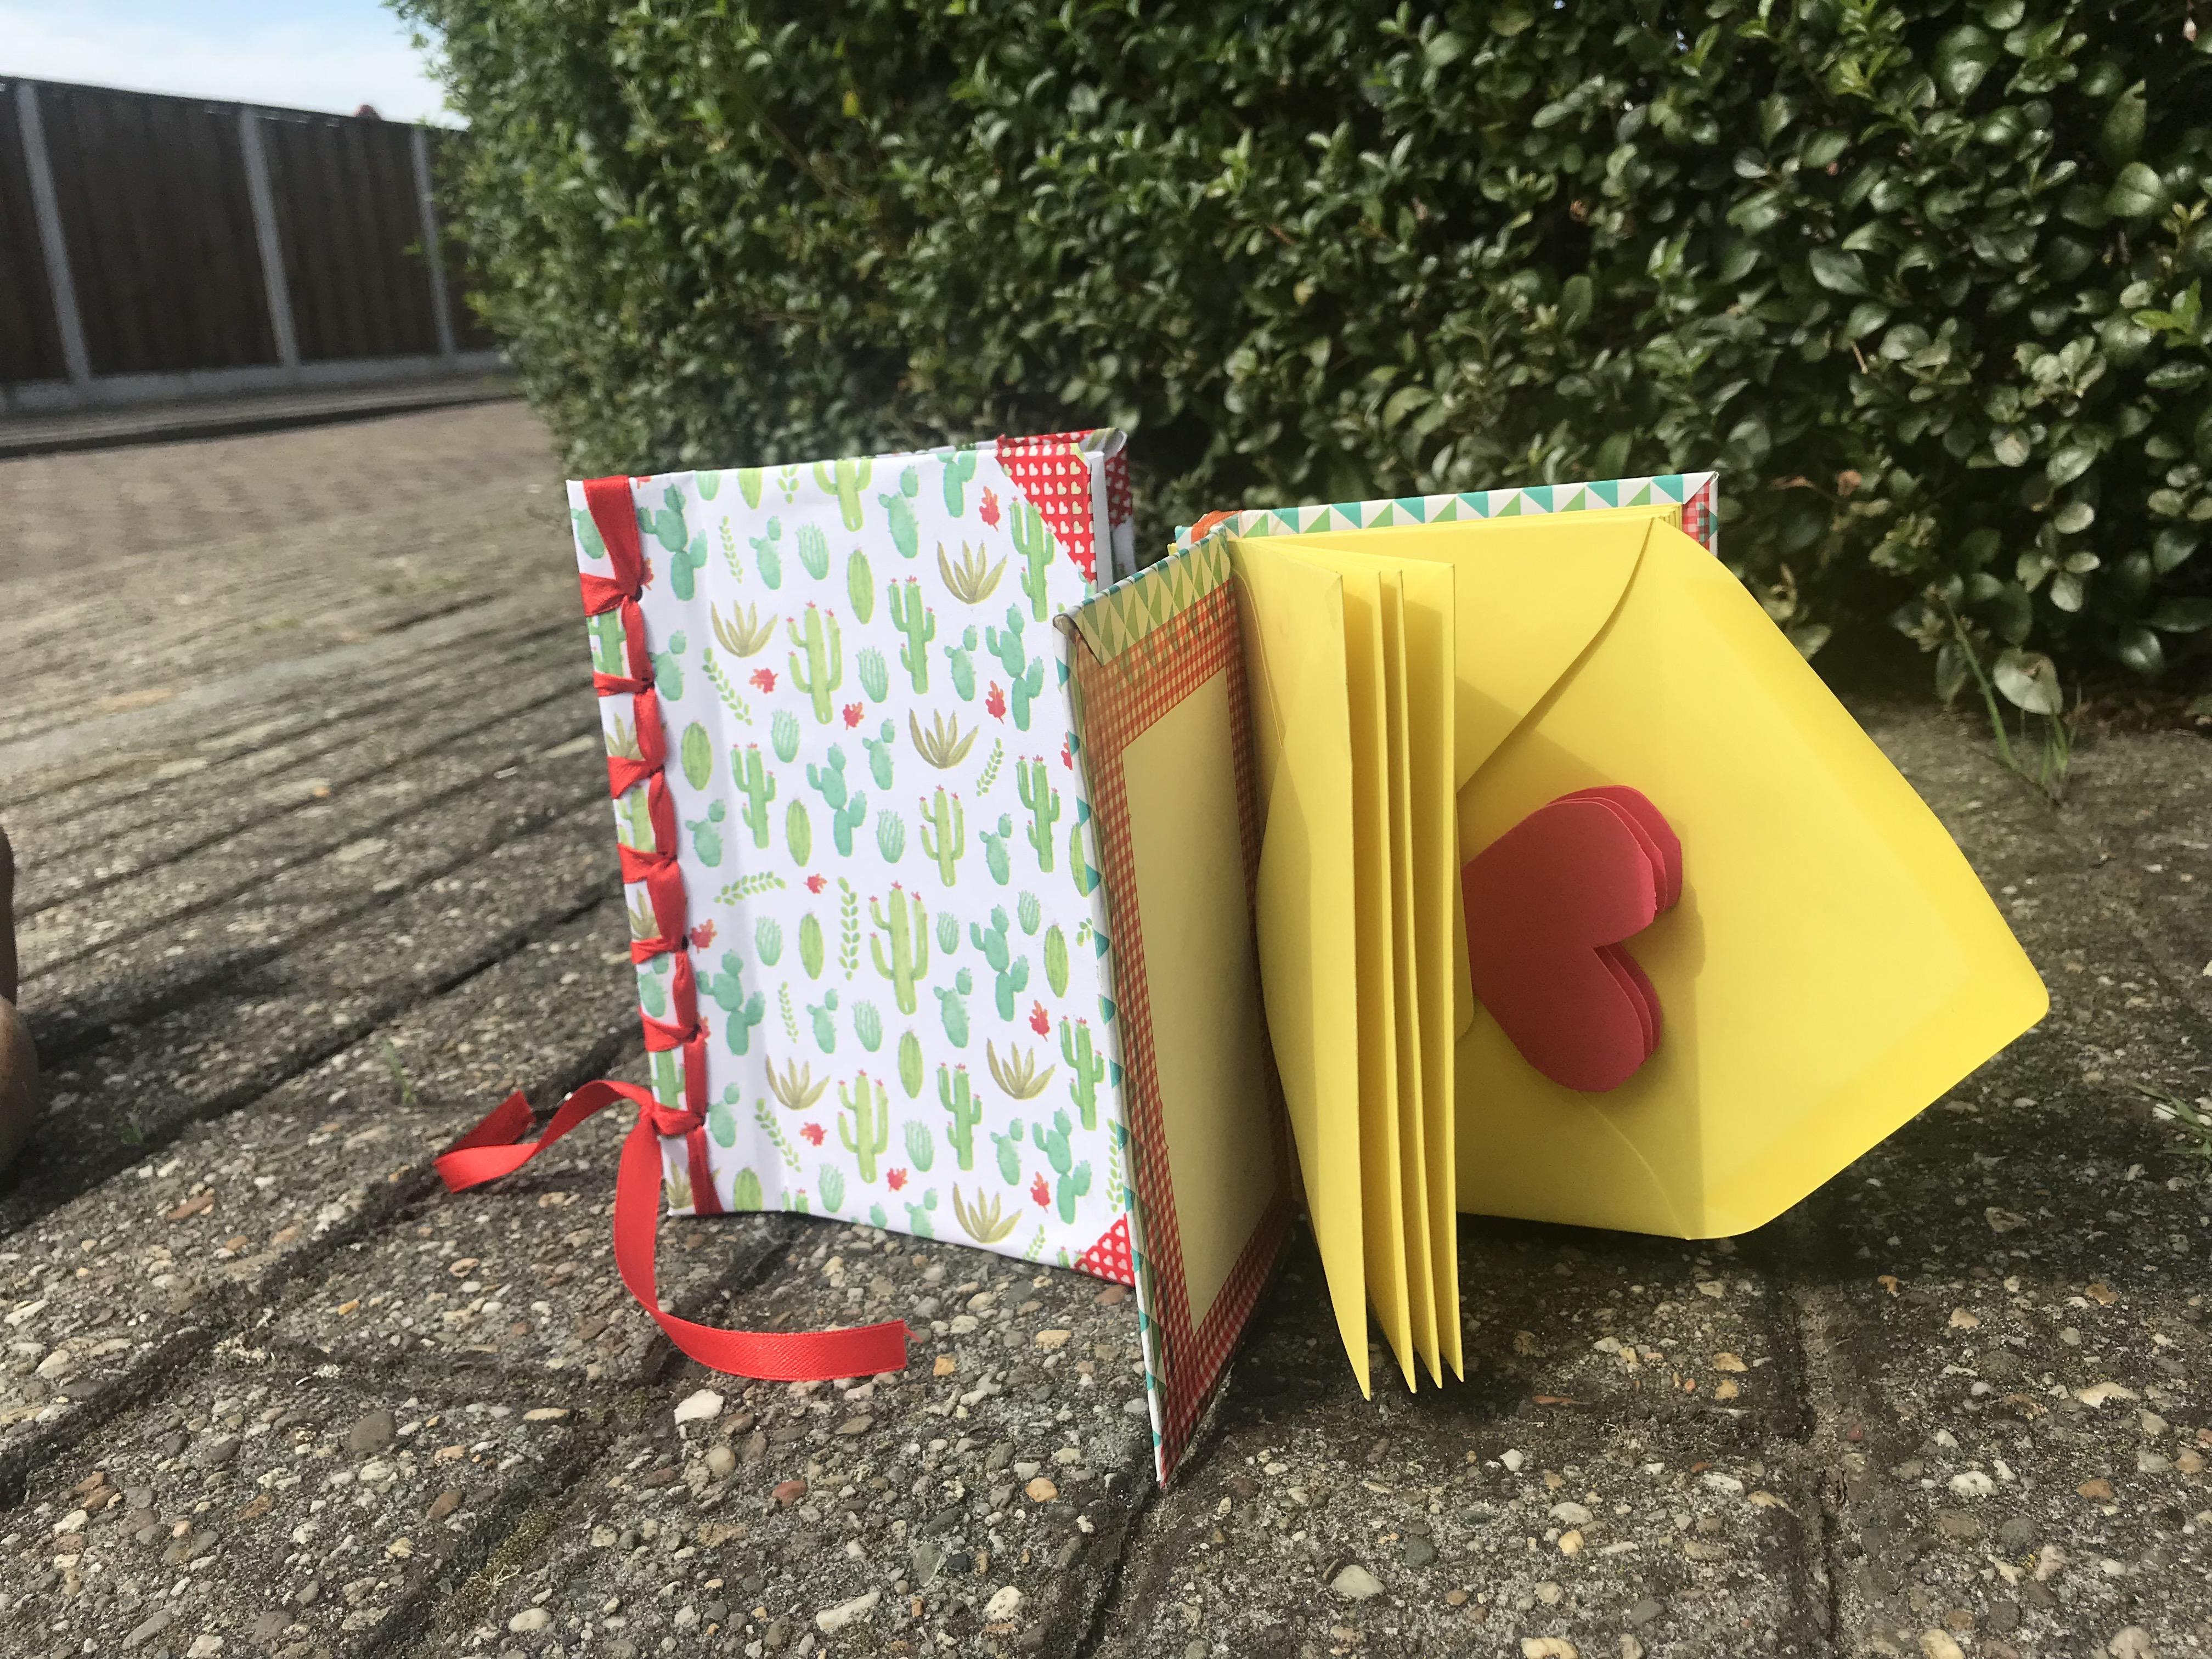 vriendenboekje maken thuis knutselen